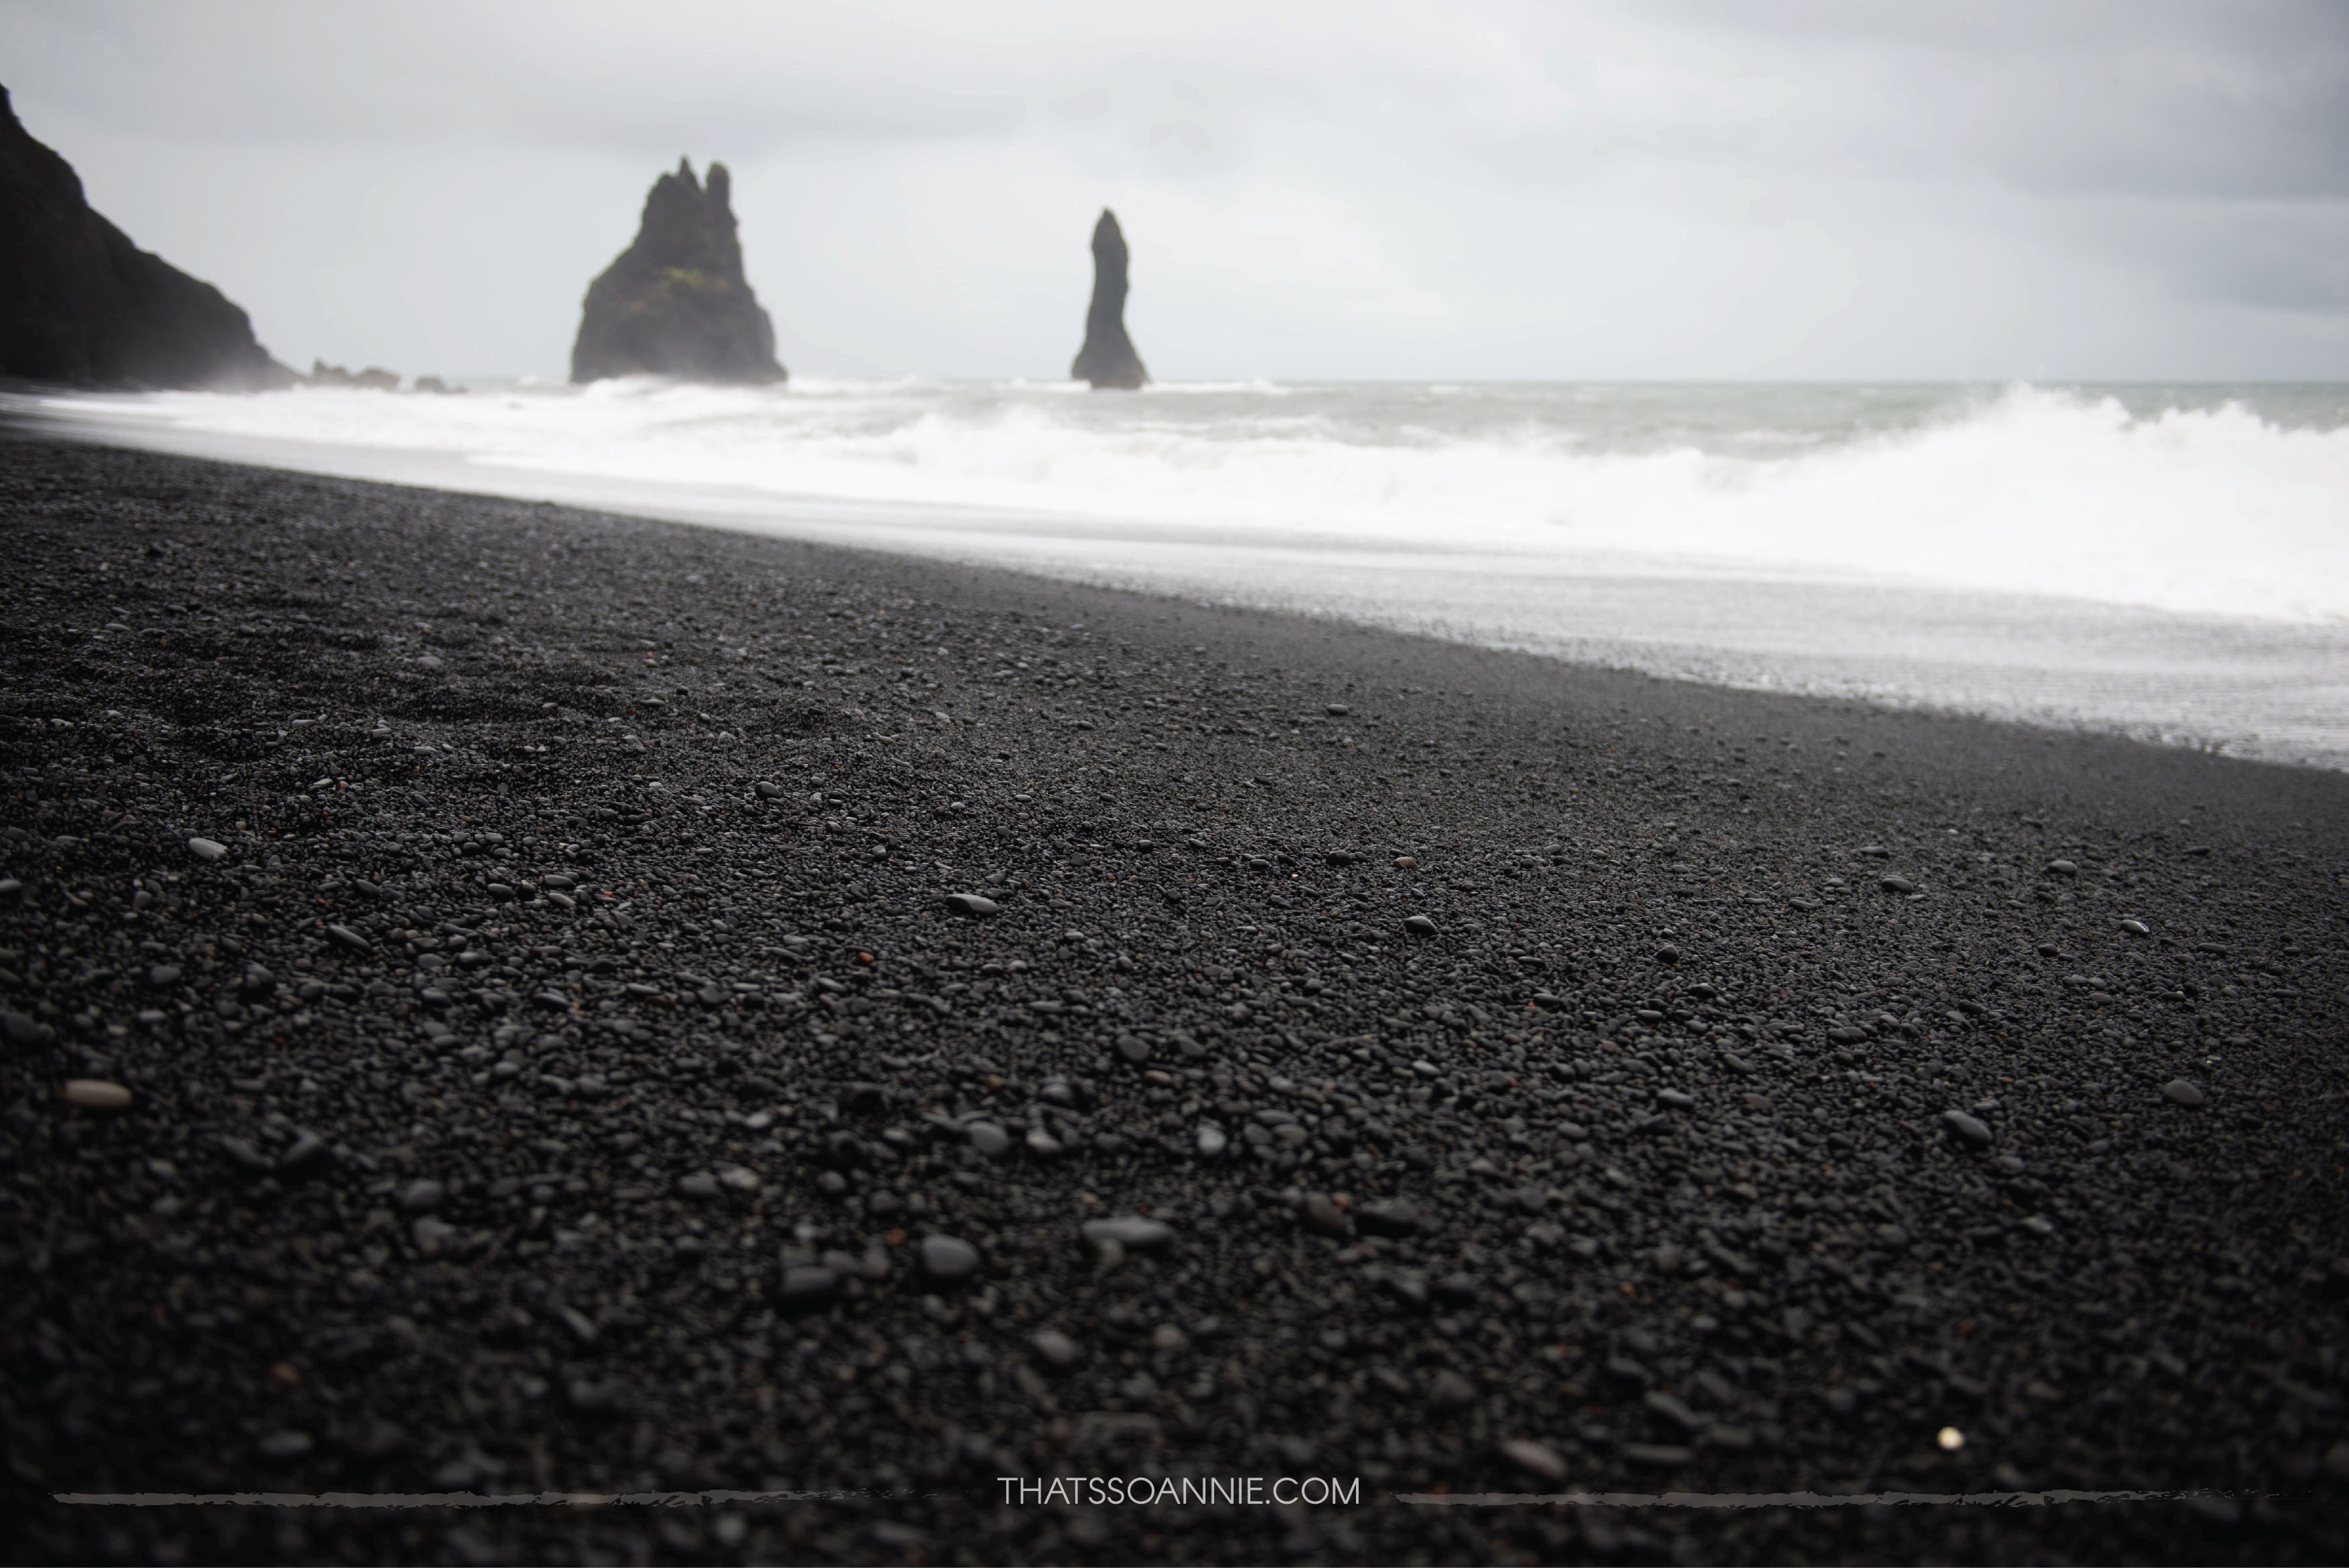 The basalt stacks of Reynisdrangar against the black pebbles of the Reynisfjara beach